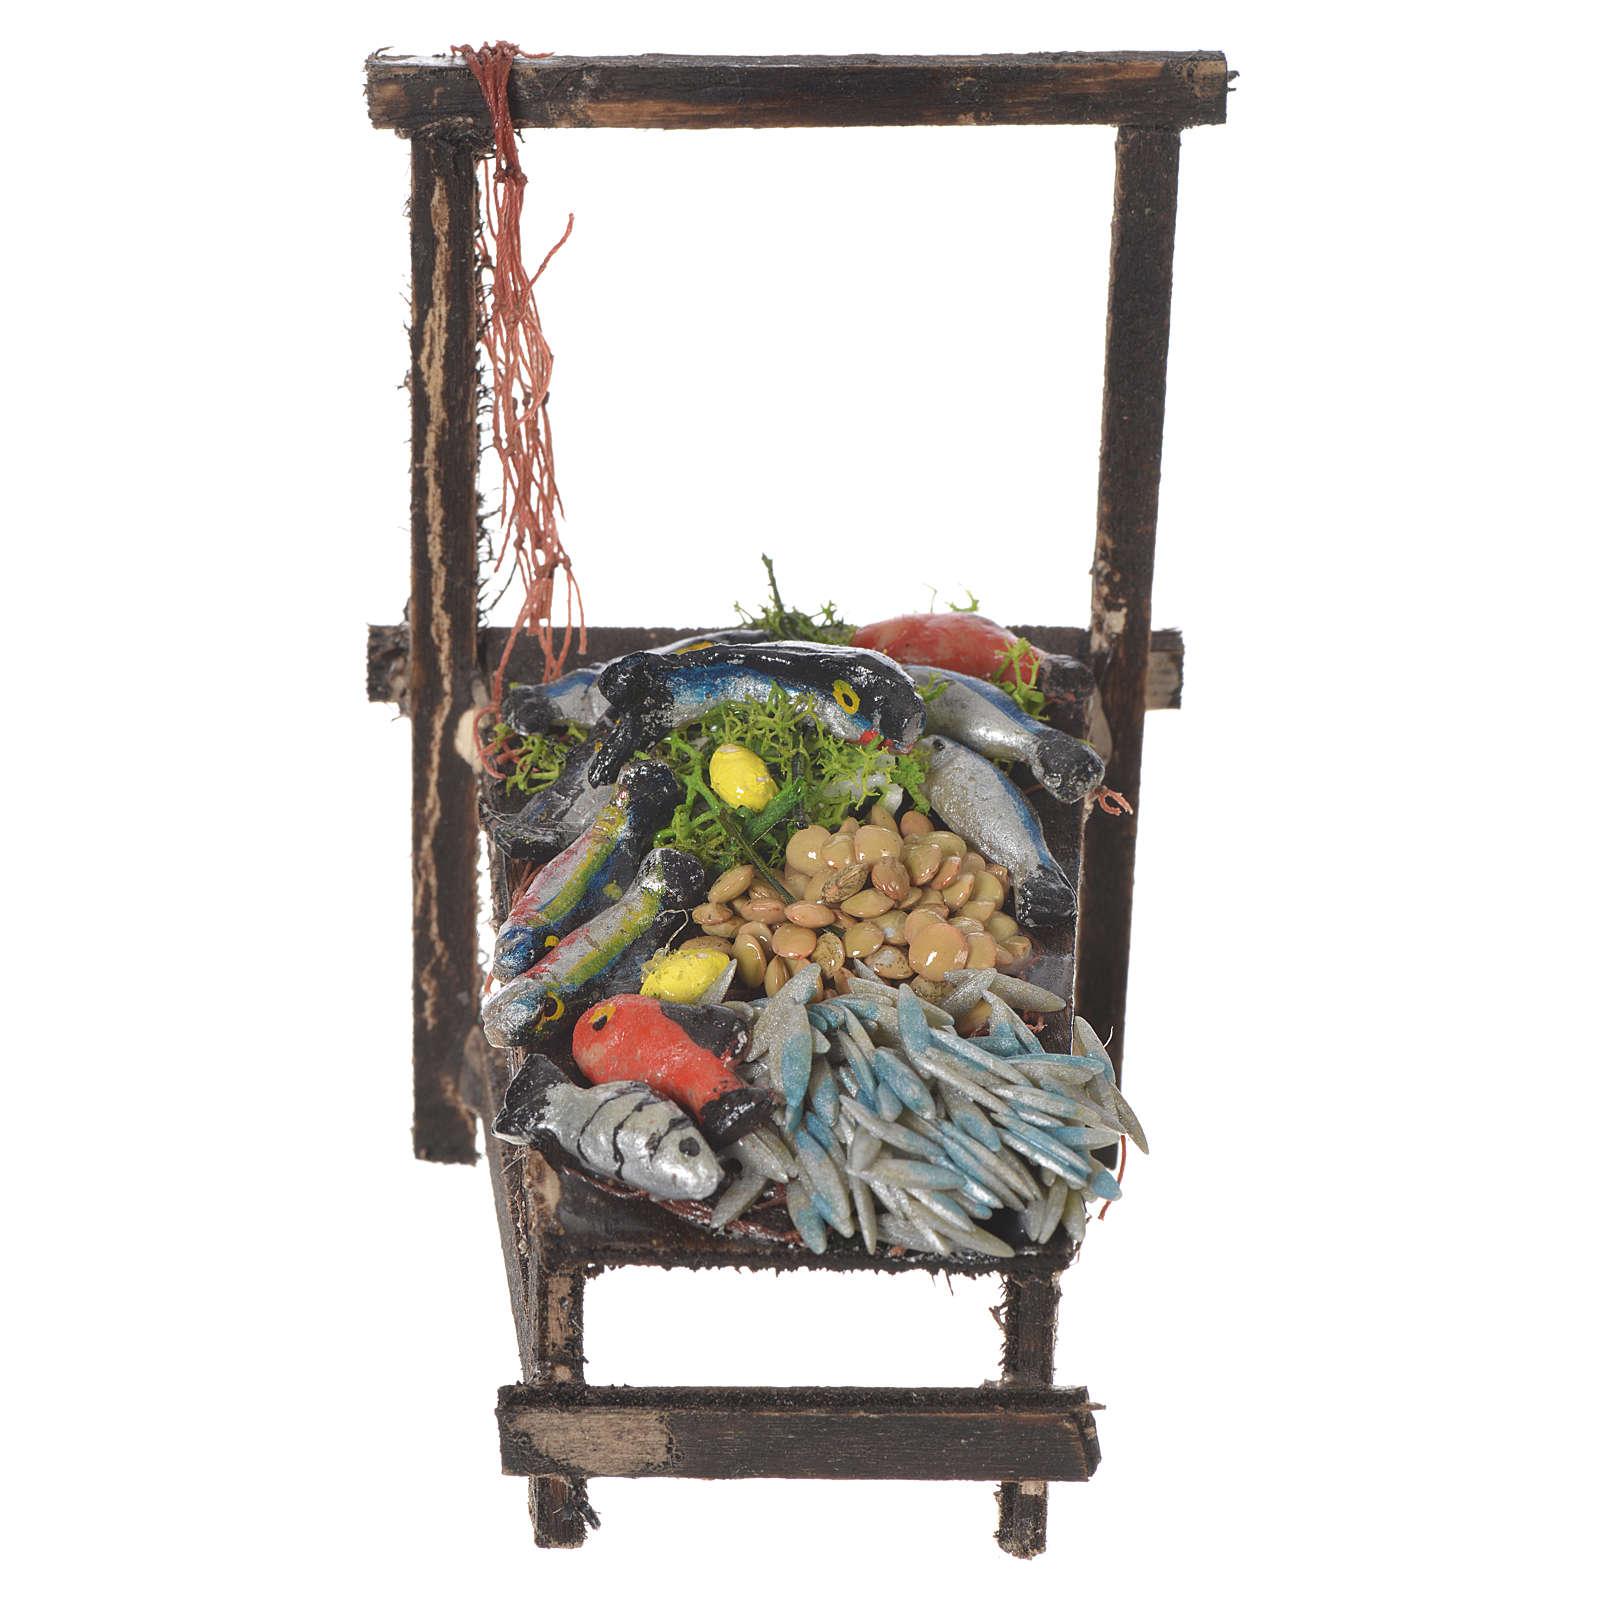 Fishmonger stall in wax, 13.5x8x5.5cm 4